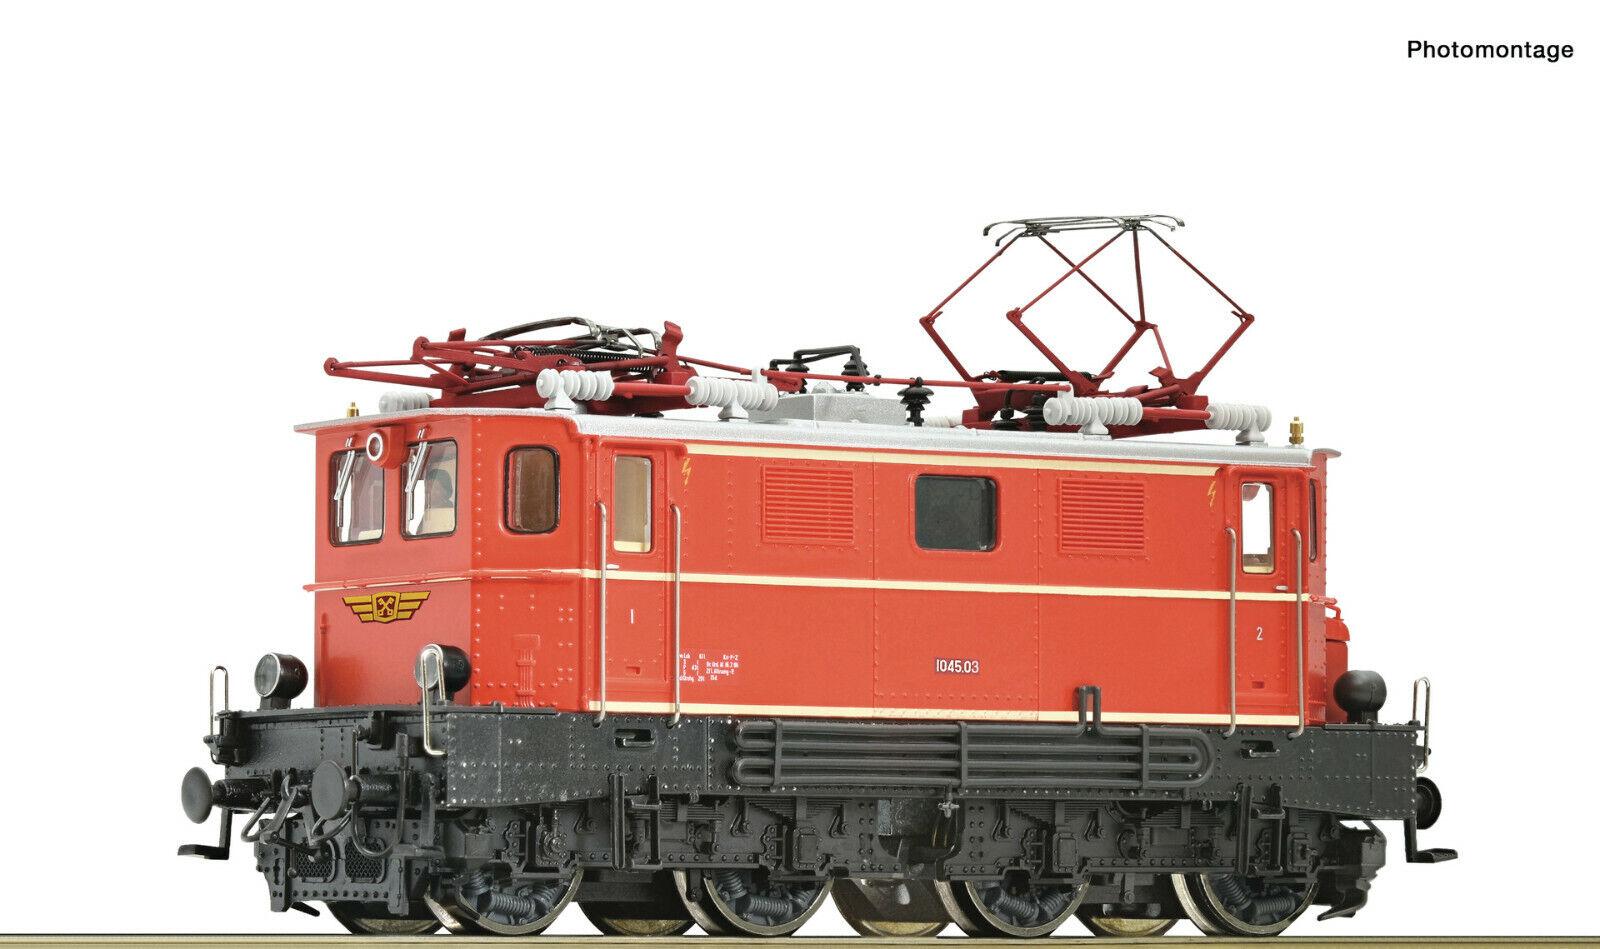 Para Märklin Roco 79503 Locomotora Eléctrica 1045.03 Montafonerbahn ( ÖBB )